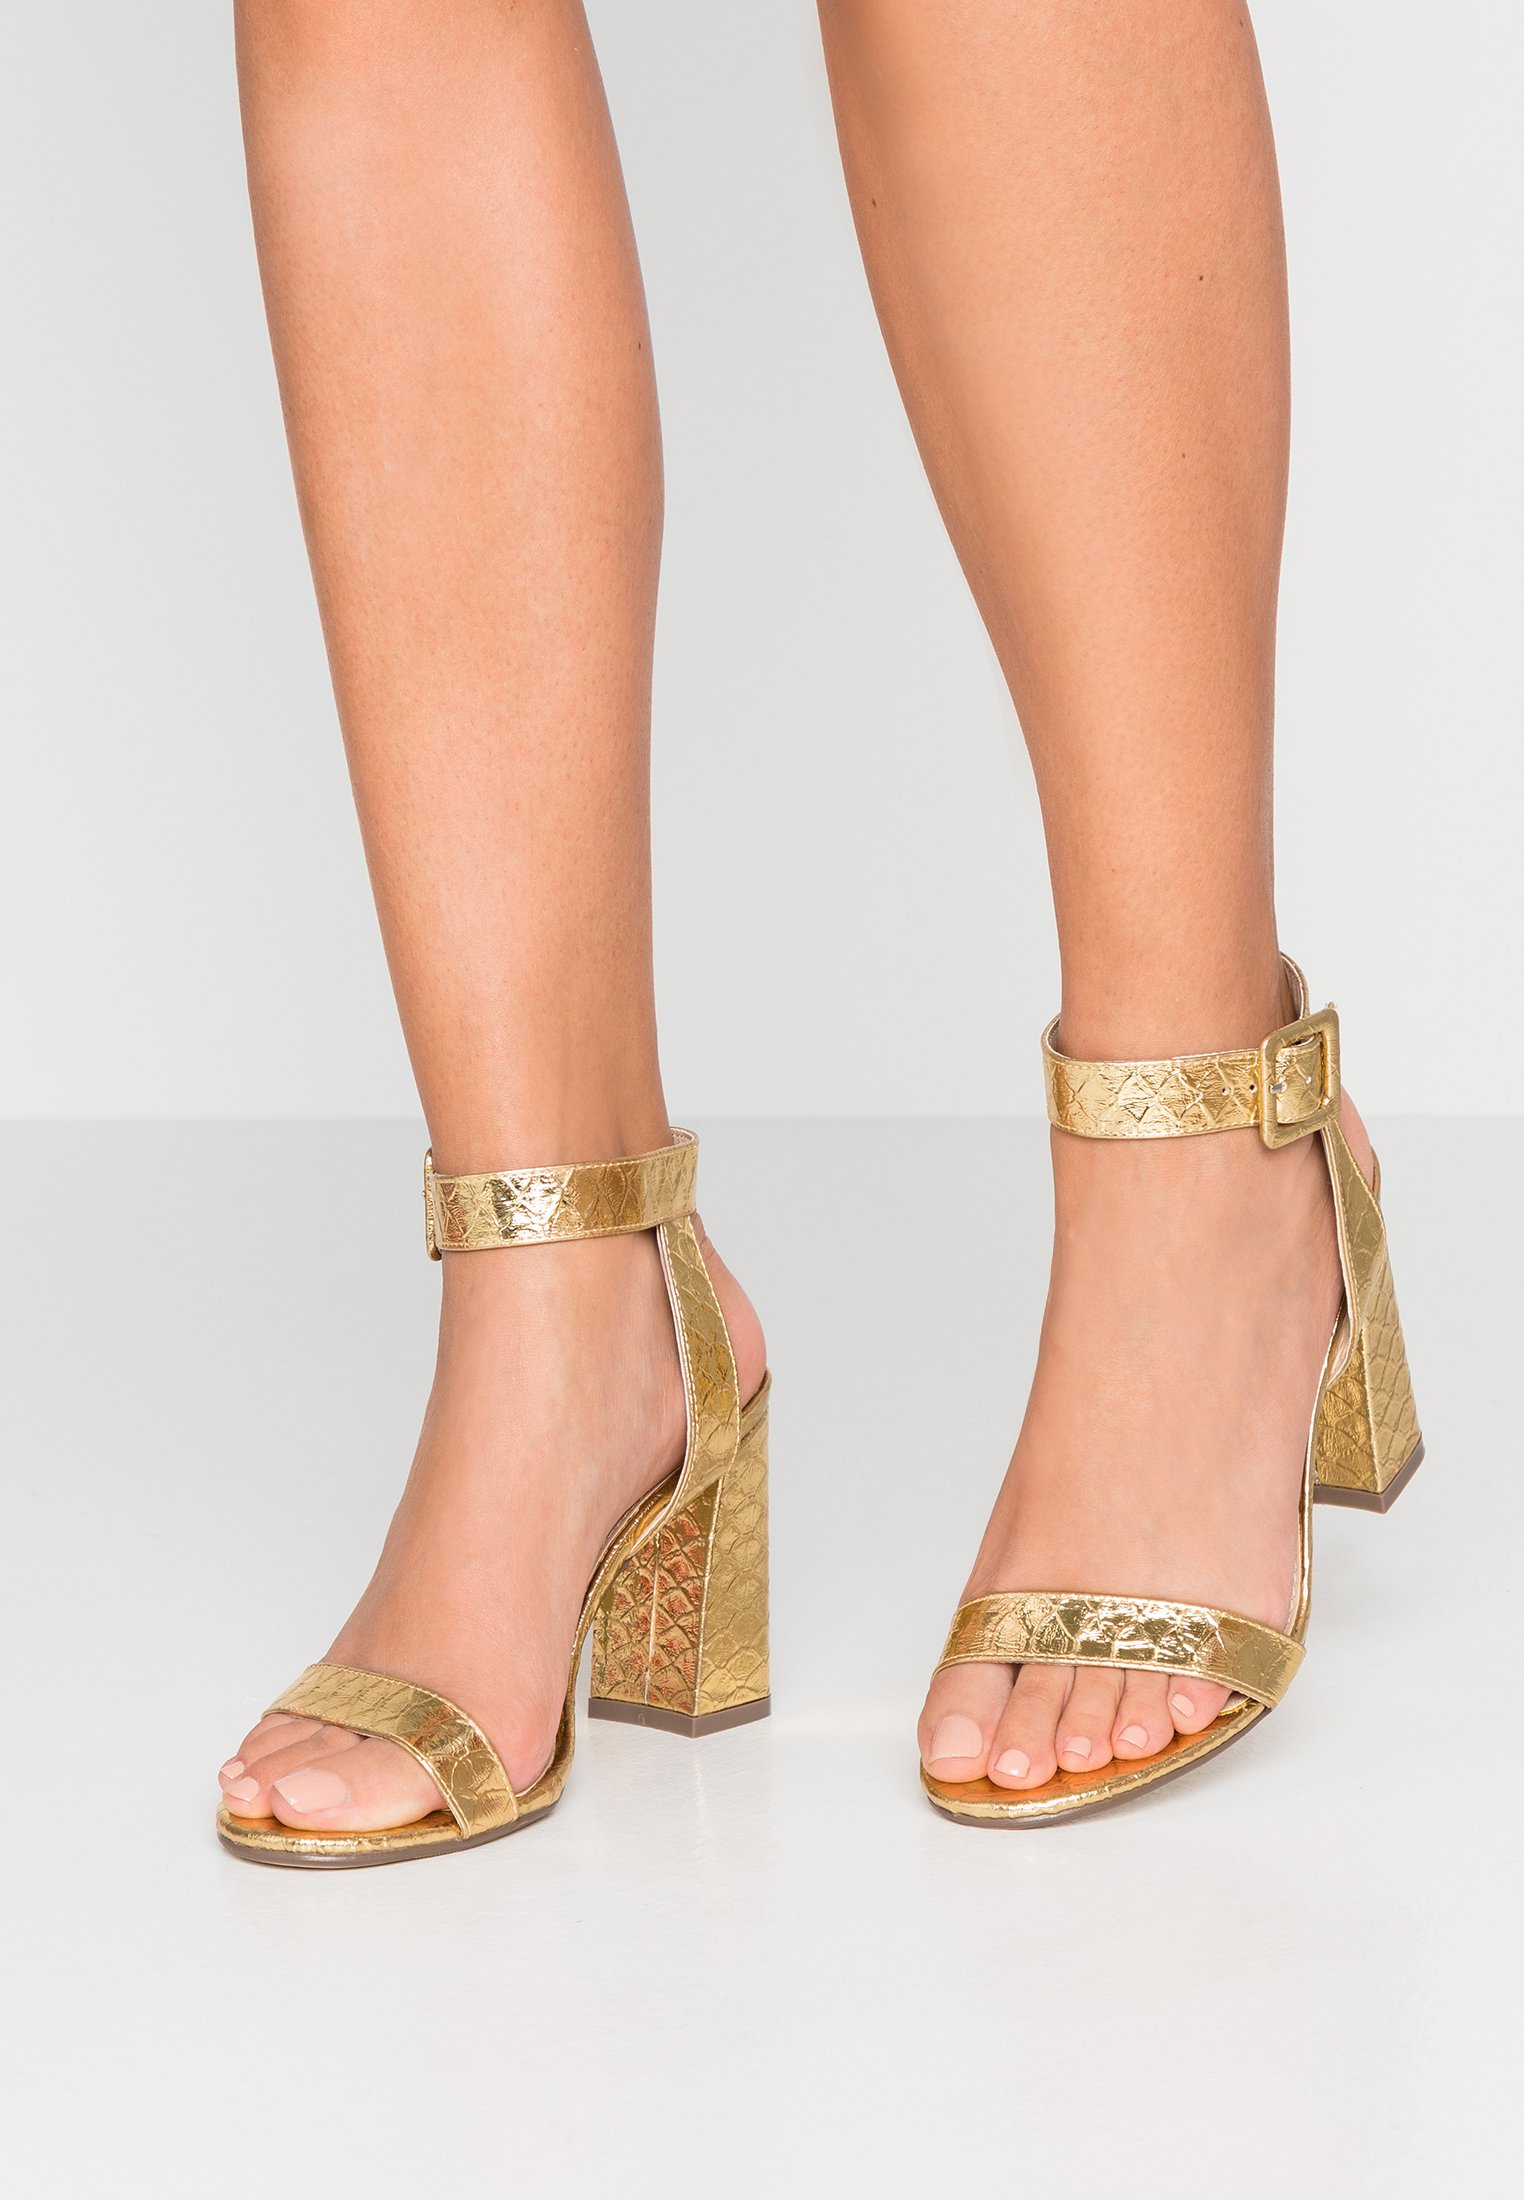 4th & Reckless ELLIS - Sandali con tacco gold